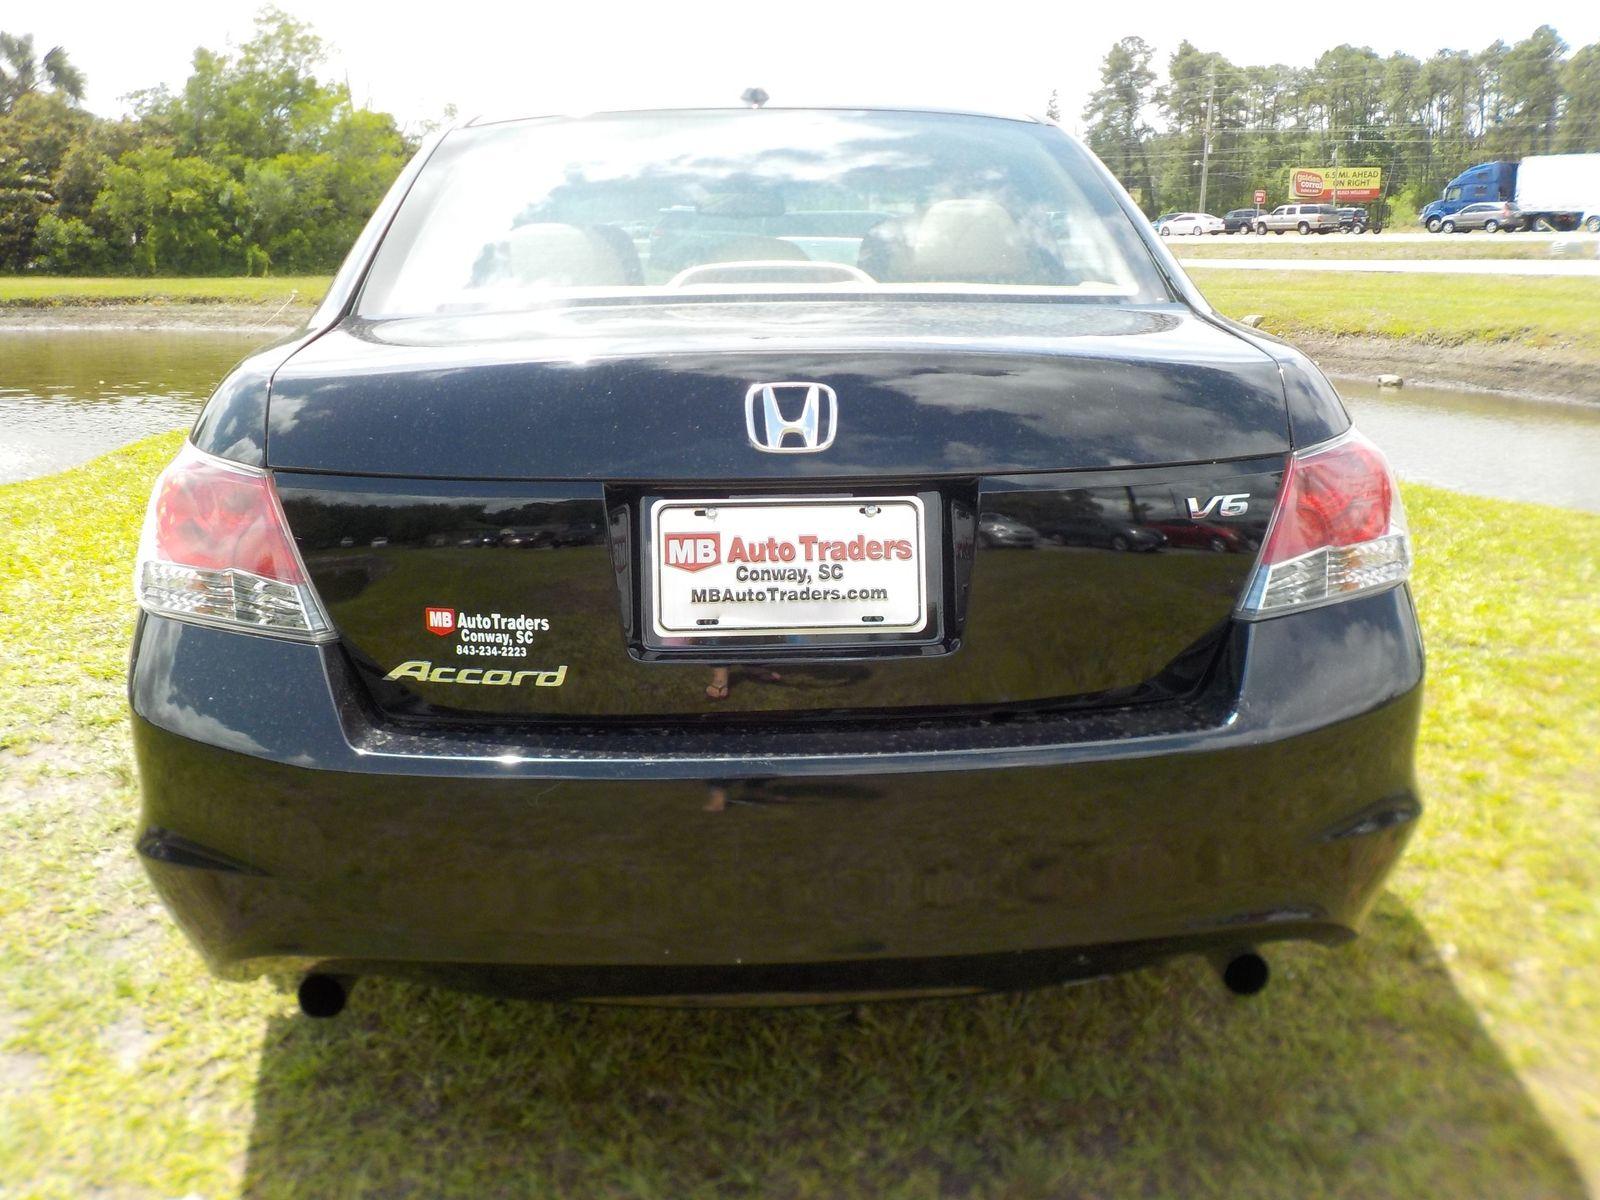 2008 Honda Accord EX L city SC Myrtle Beach Auto Traders